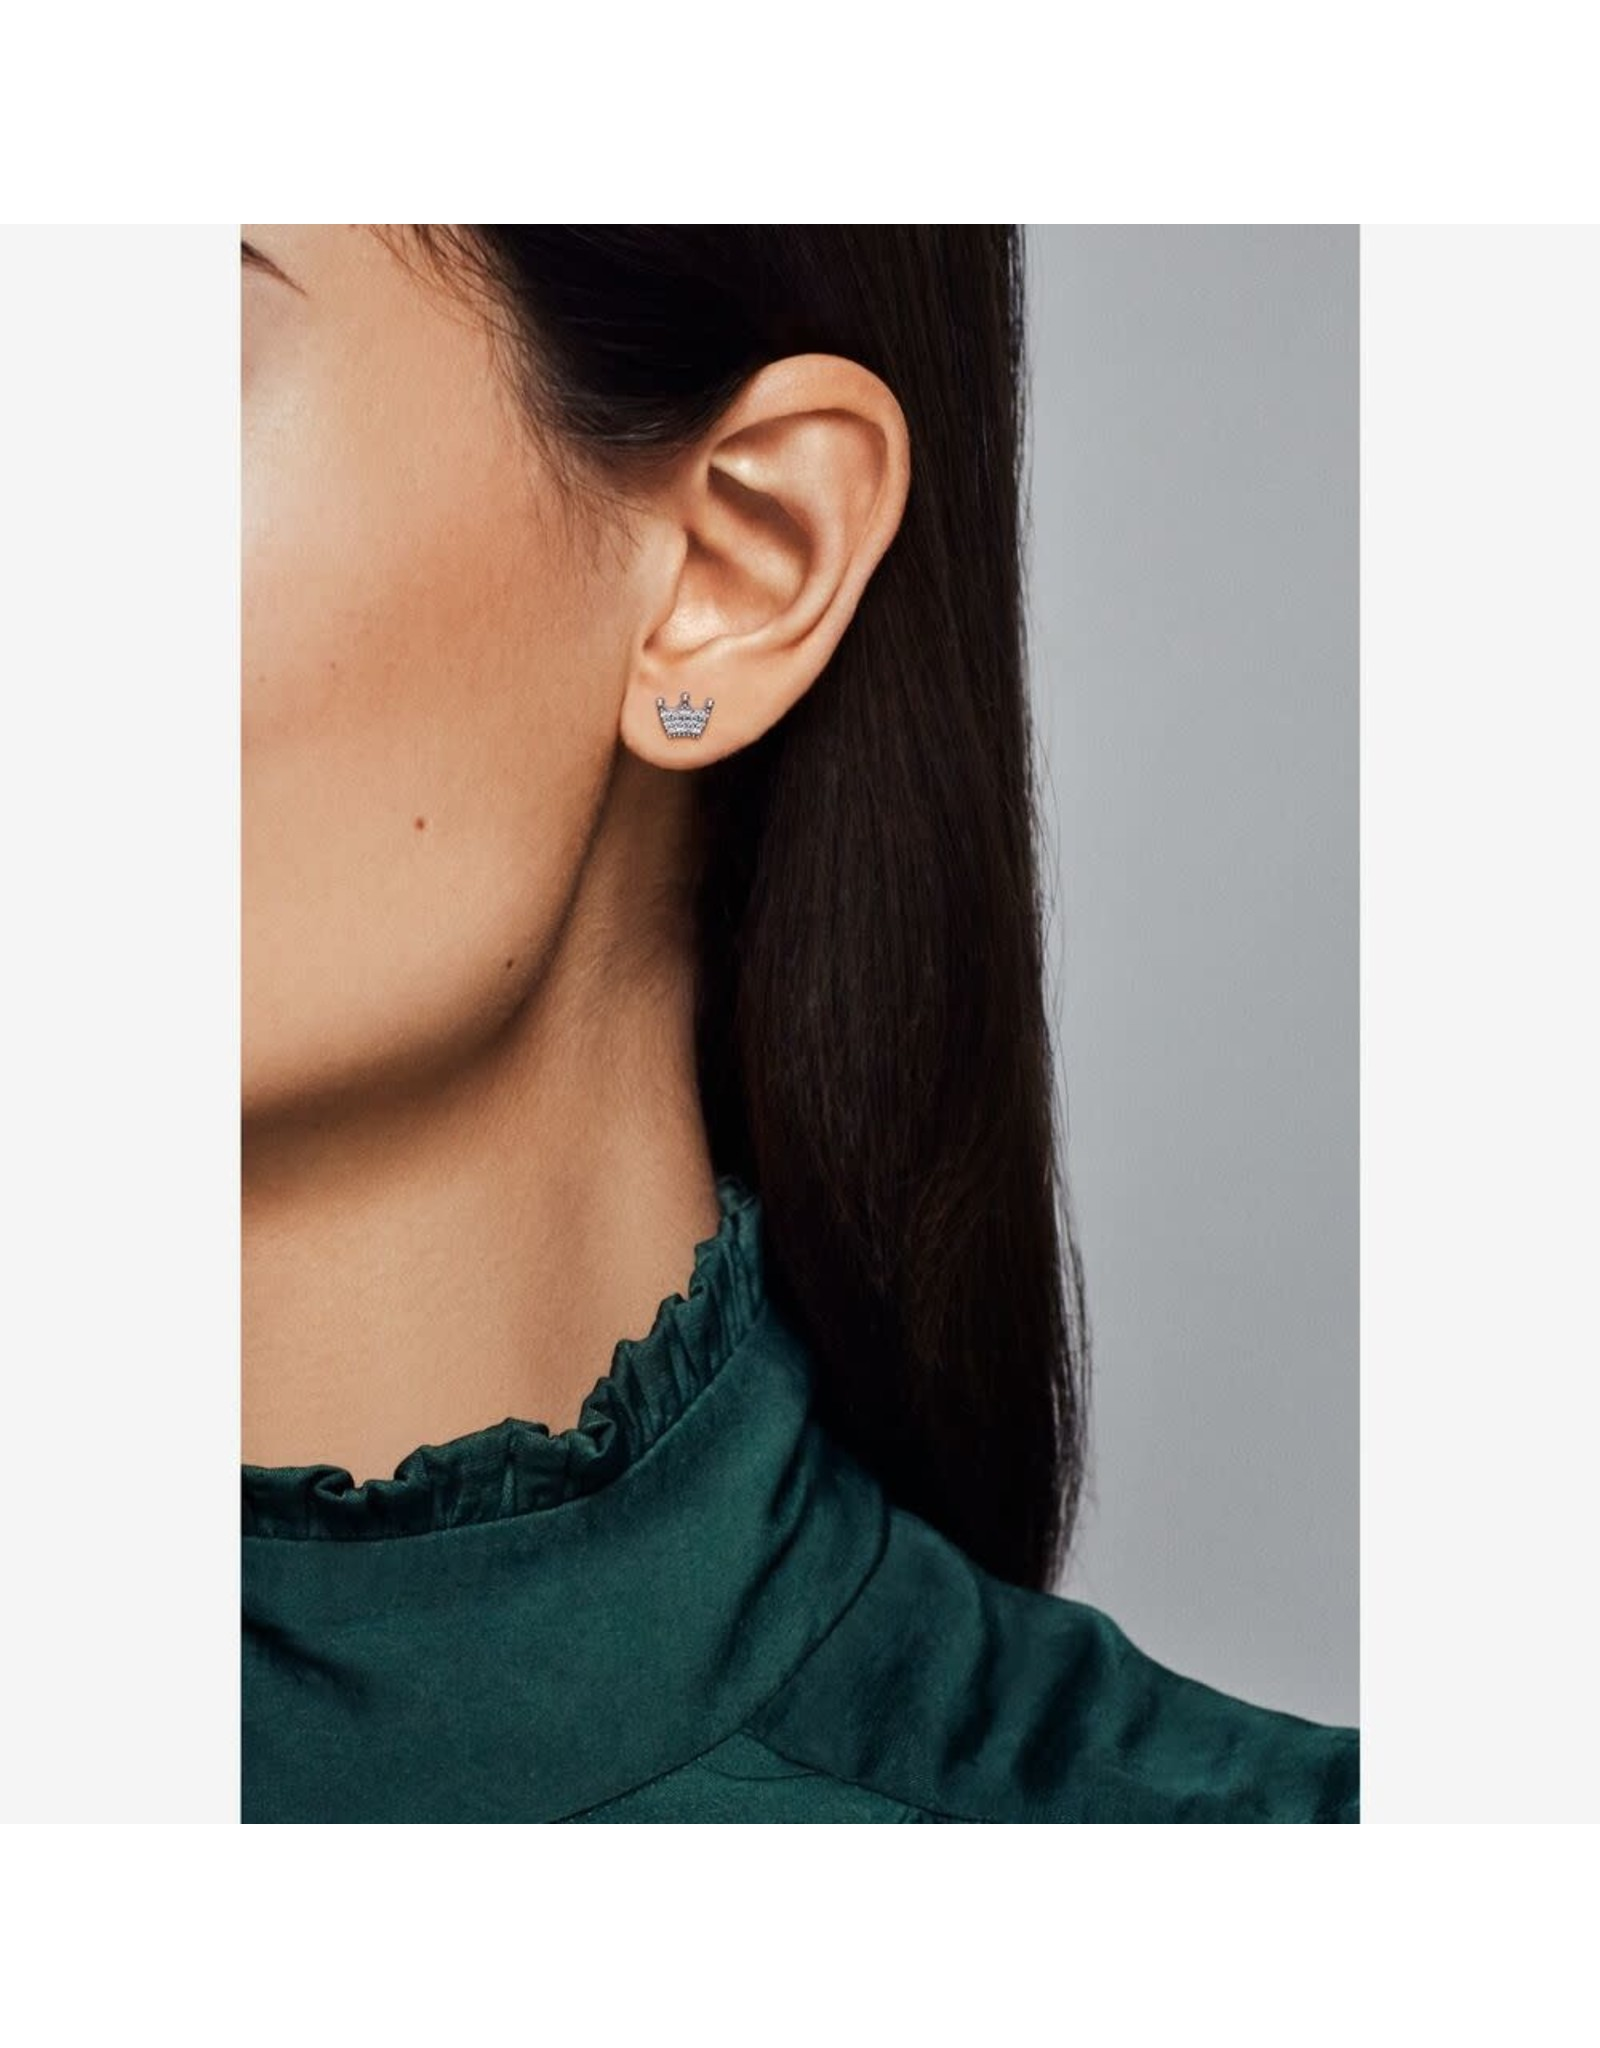 Pandora Pandora Earrings,297127CZ, Crown Stud